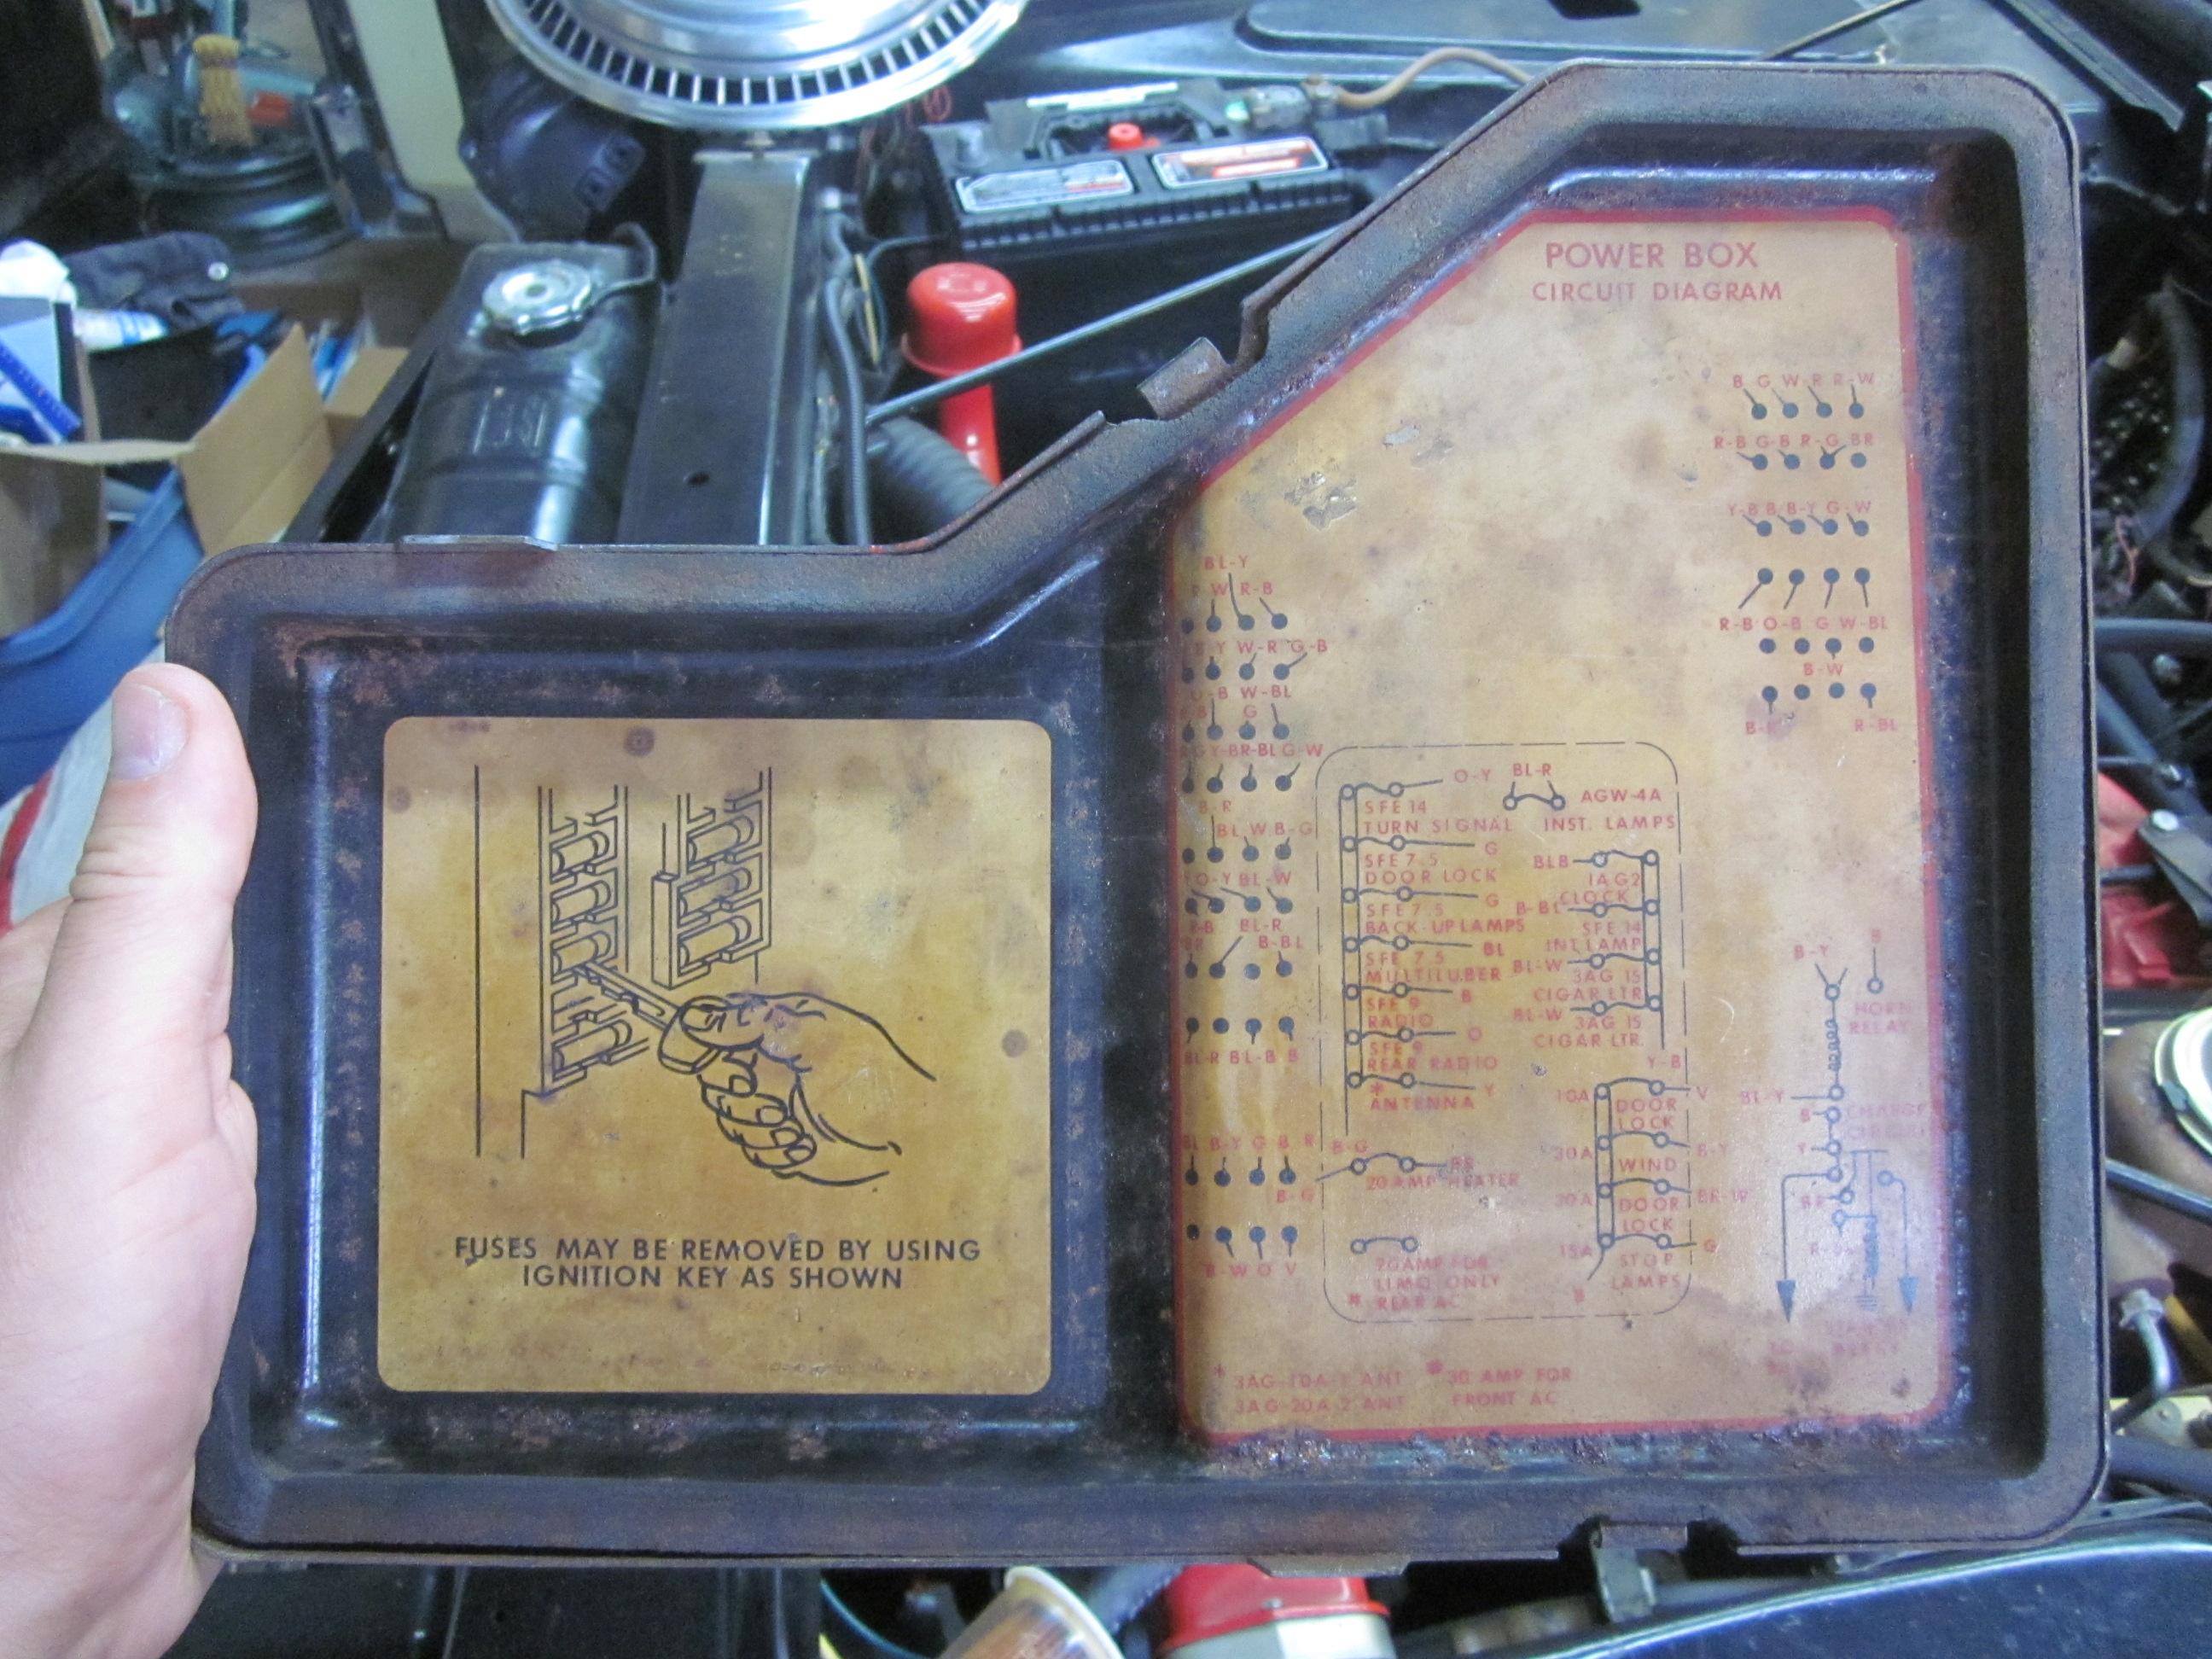 hight resolution of 1970 ford thunderbird fuse box diagram wiring diagrams mon 1970 ford thunderbird fuse box location 1970 thunderbird fuse box